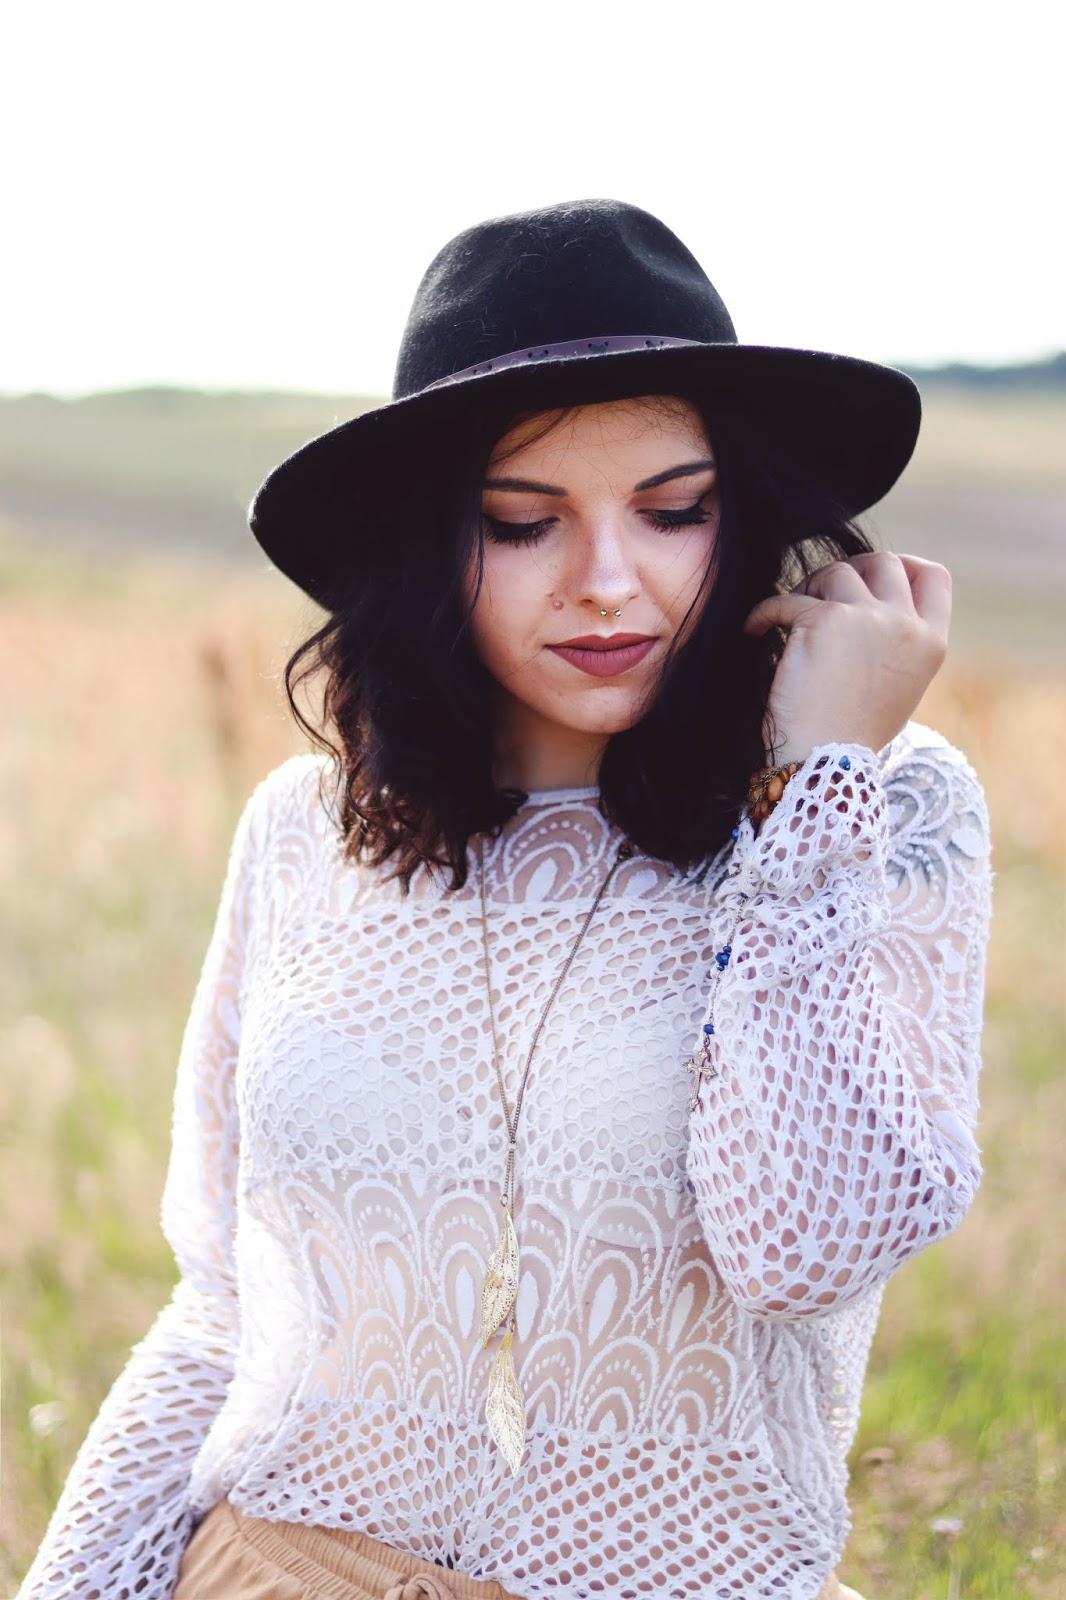 kapelusz H&M i ażurowa bluzka